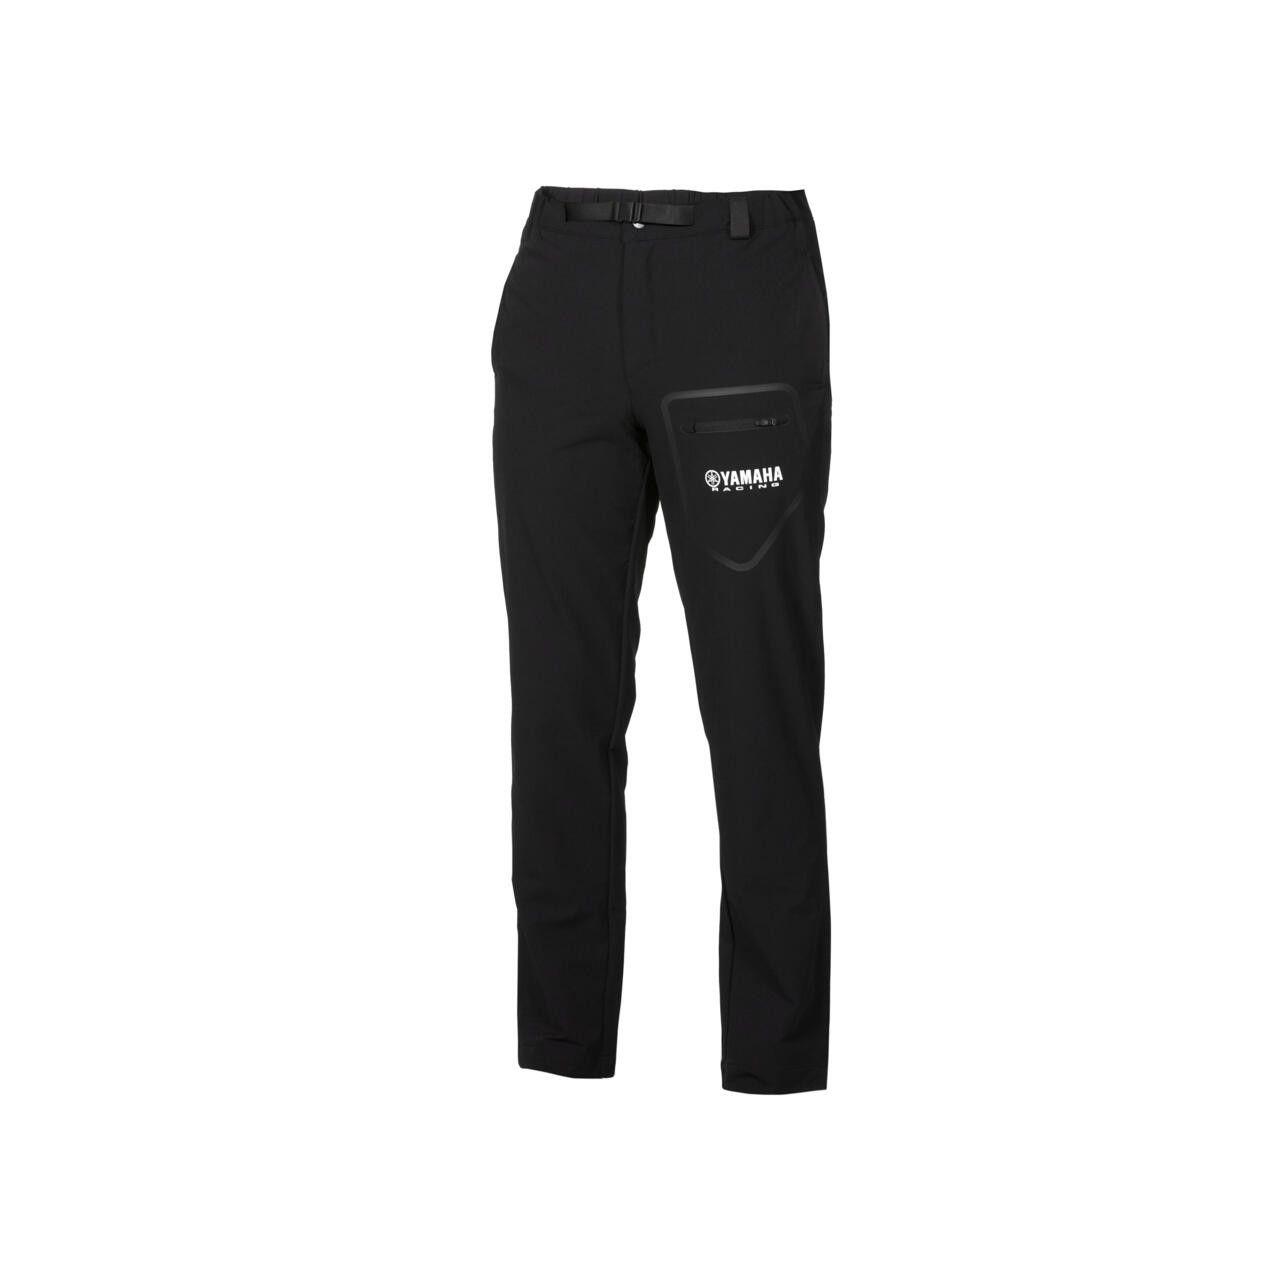 YAMAHA Pantalon tissu homme Tyne Paddock 2020